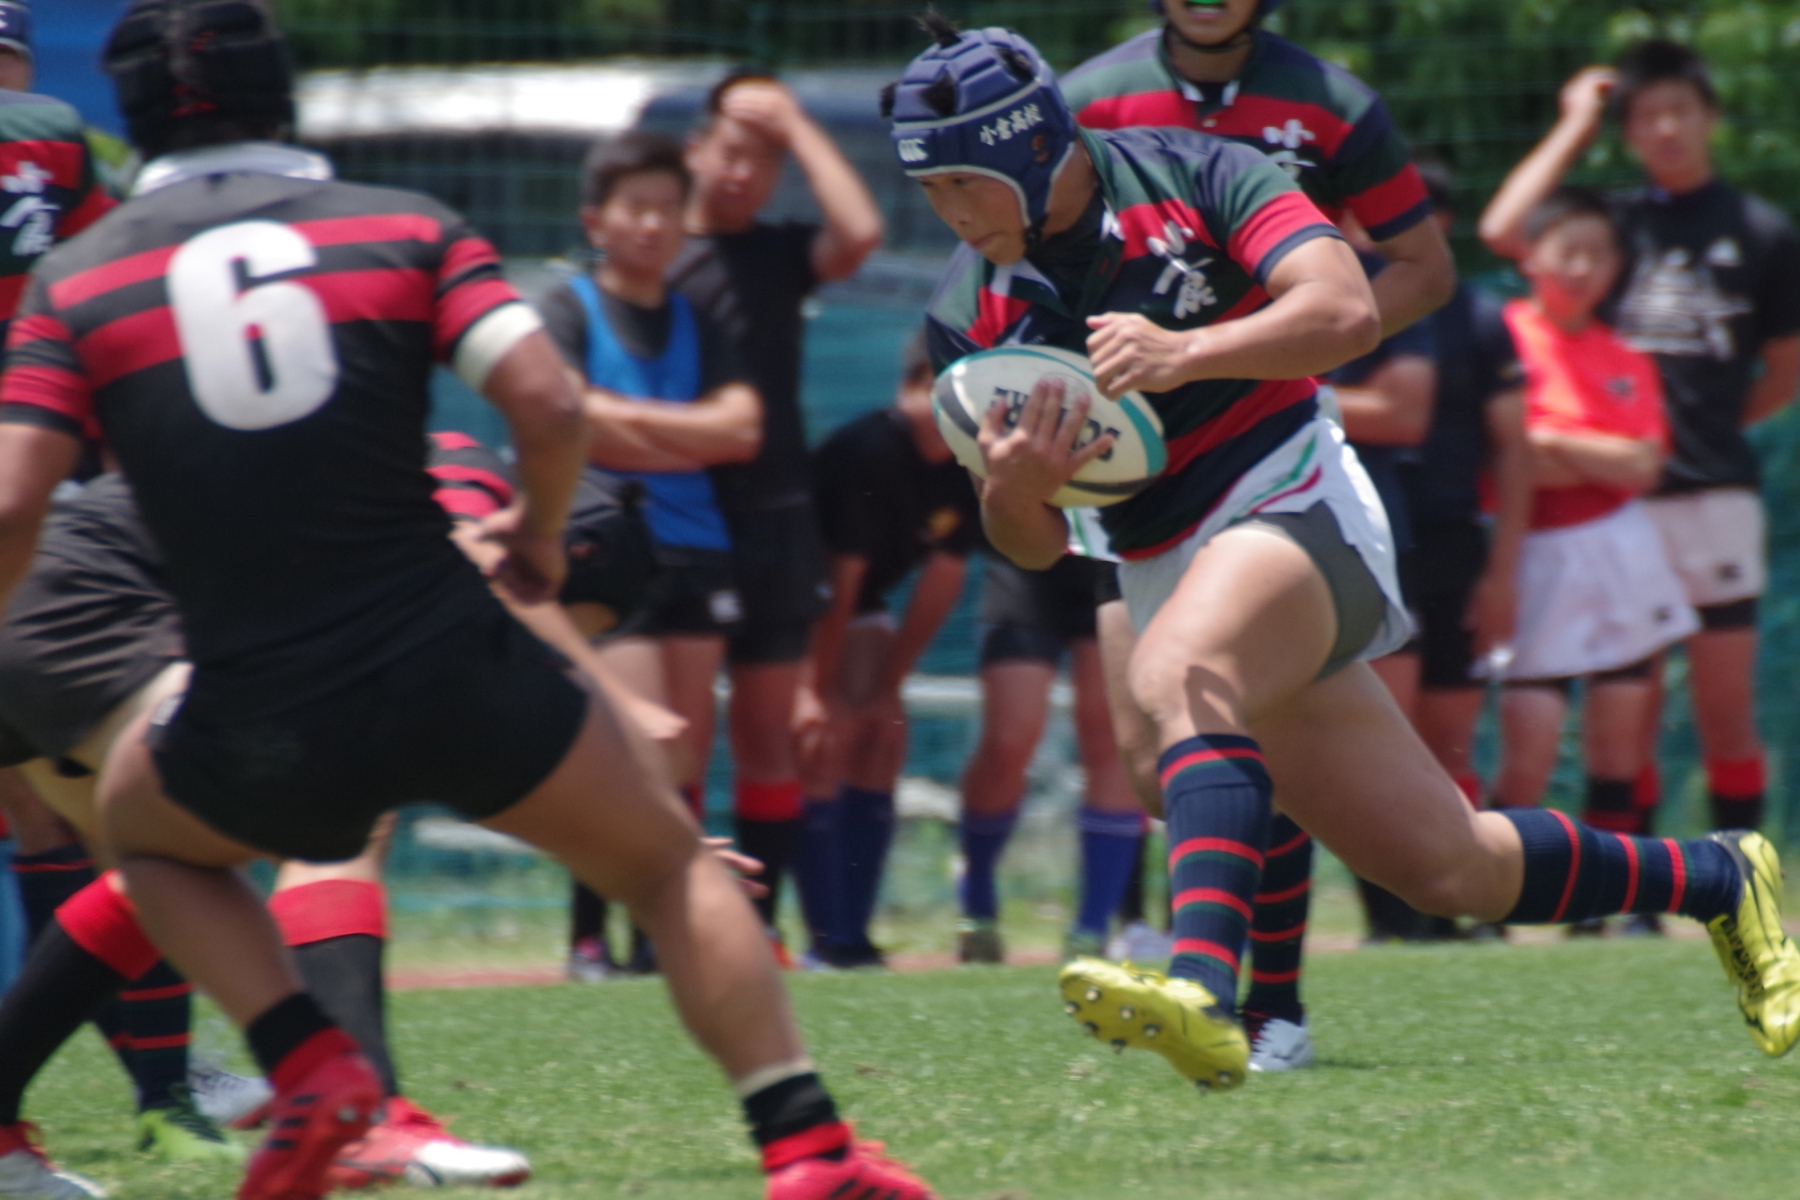 http://kokura-rugby.sakura.ne.jp/180520_123826_0290.jpg